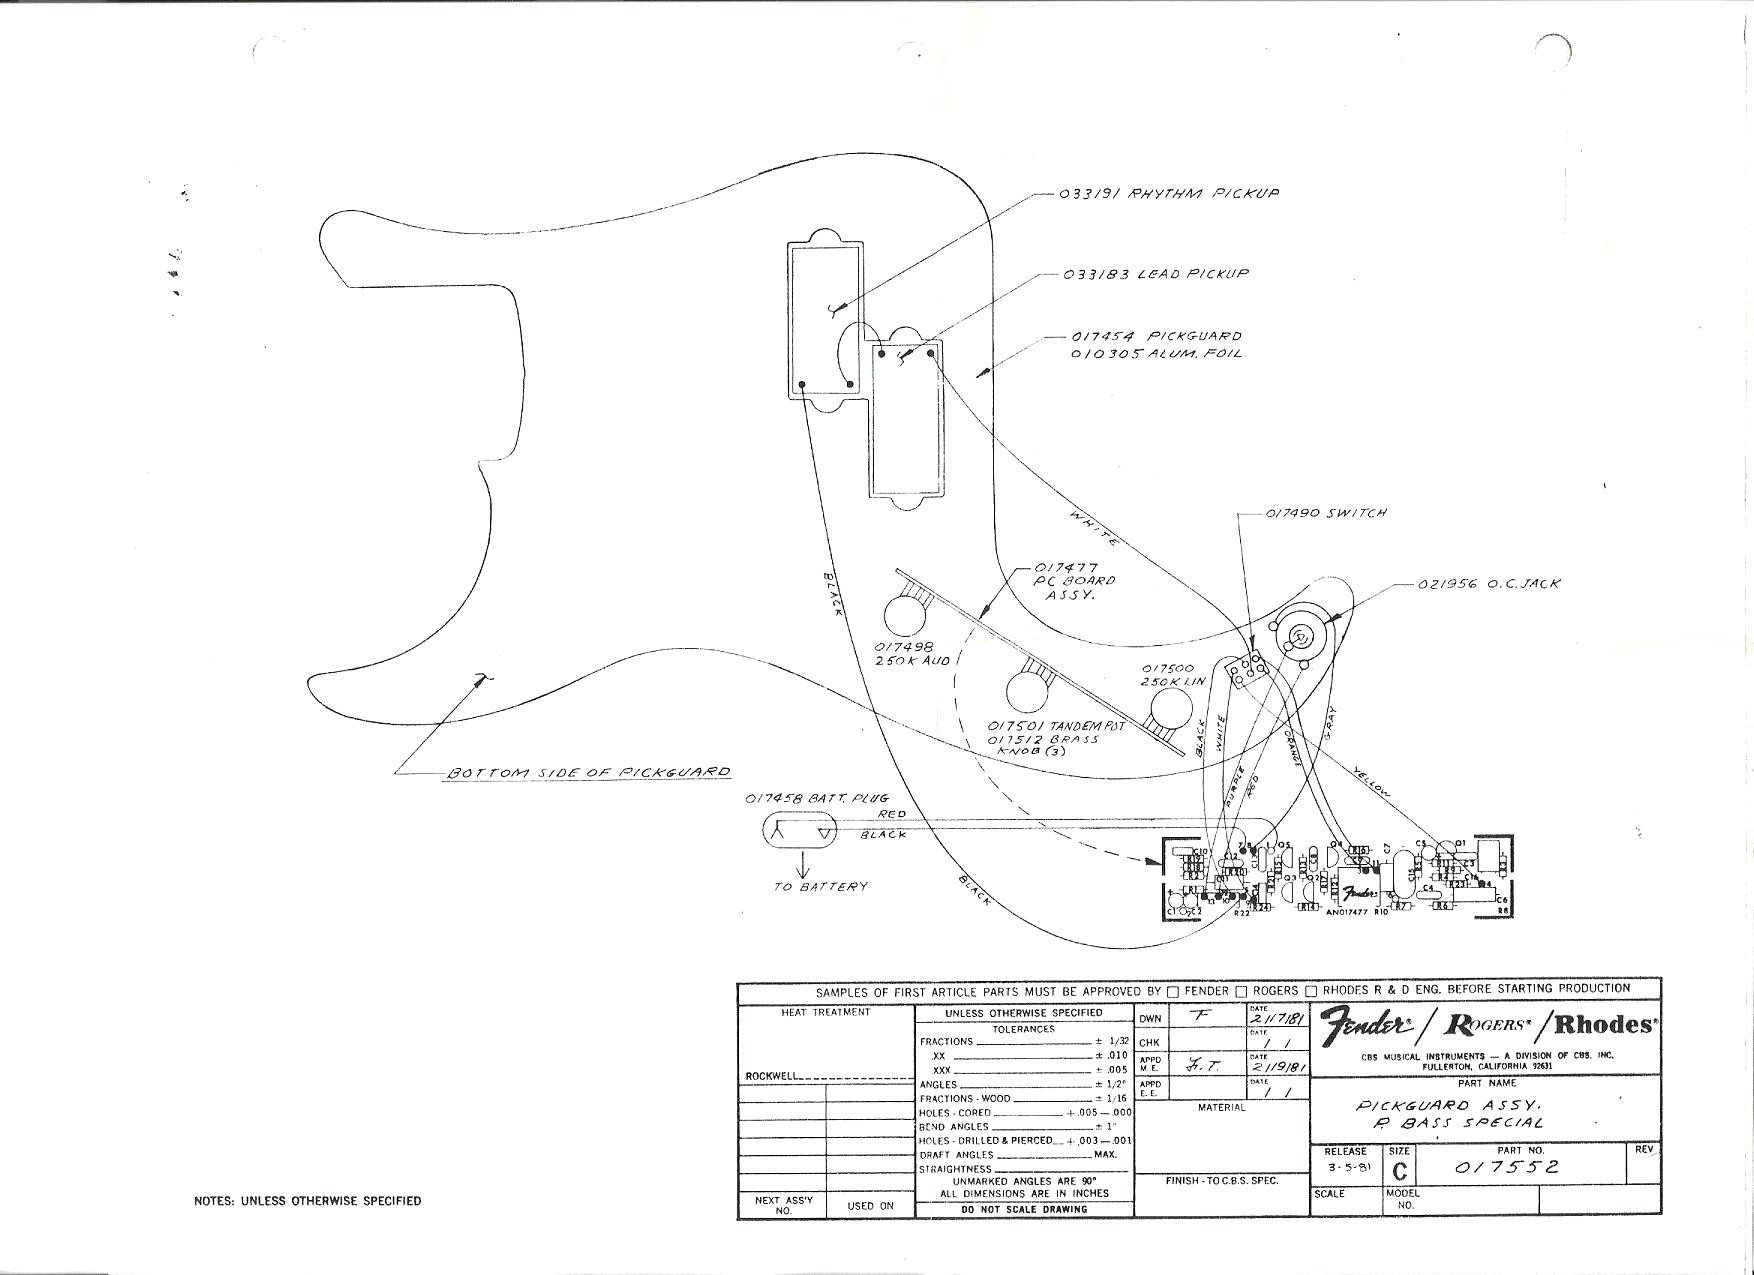 Fender Precision Bass Wiring Diagram | My Wiring DIagram